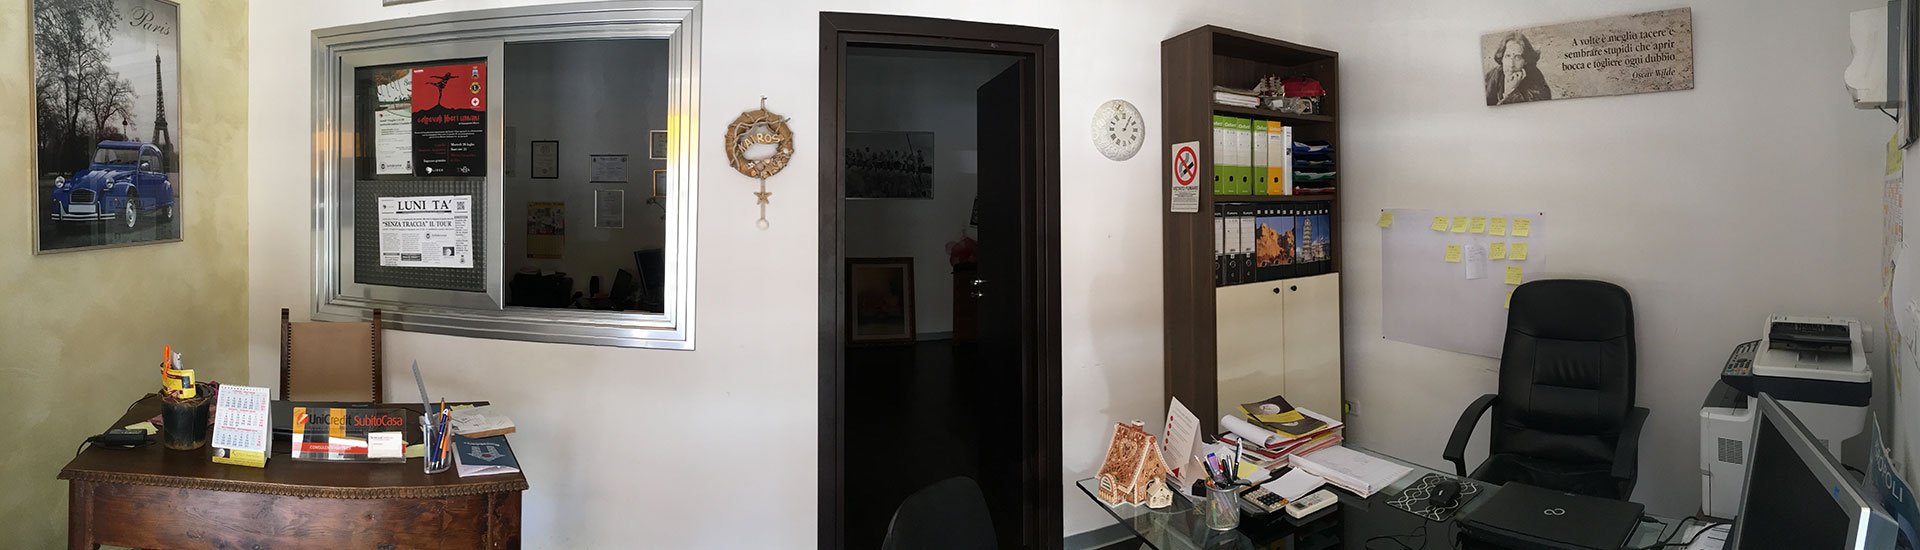 Agenzia Immobiliare Kairos